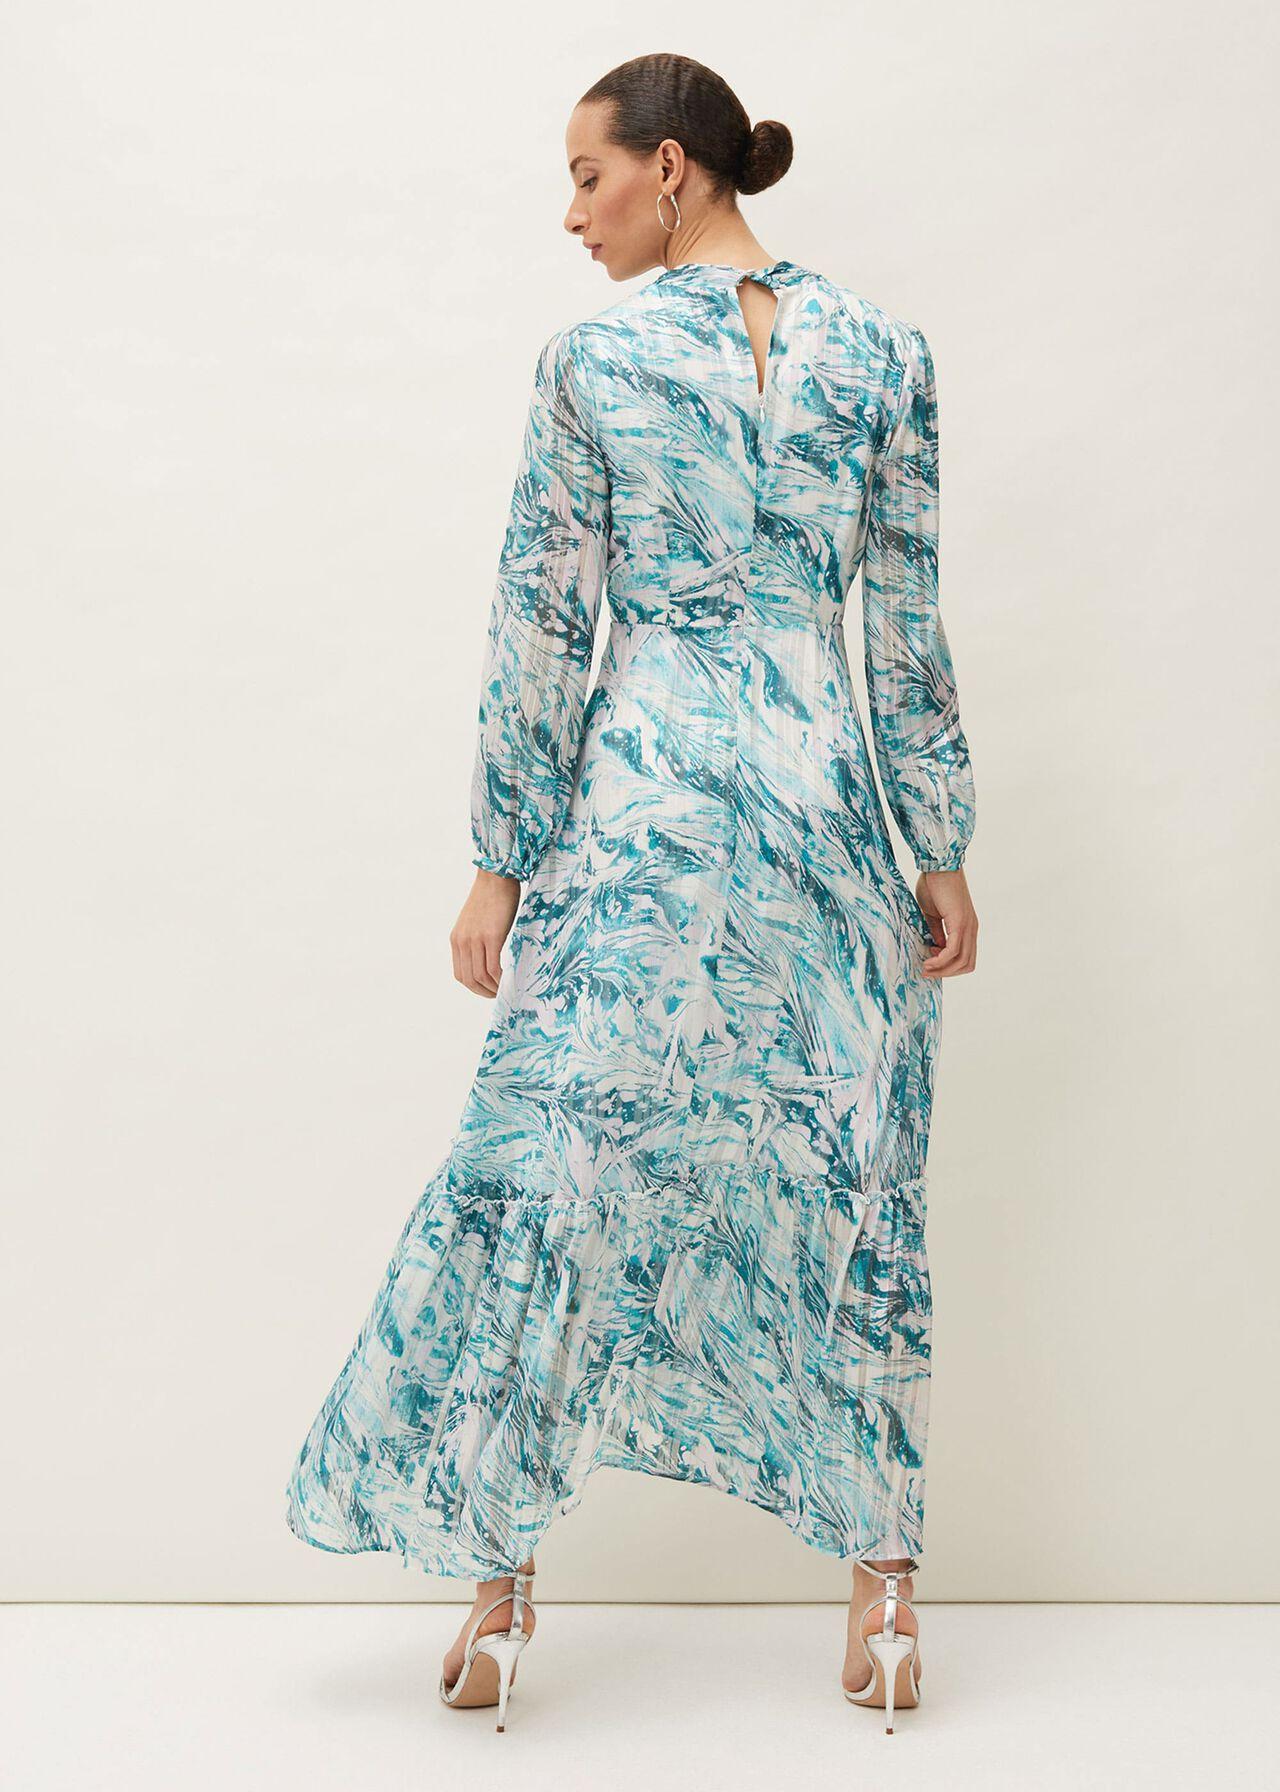 Lauretta Abstract Print Maxi Dress